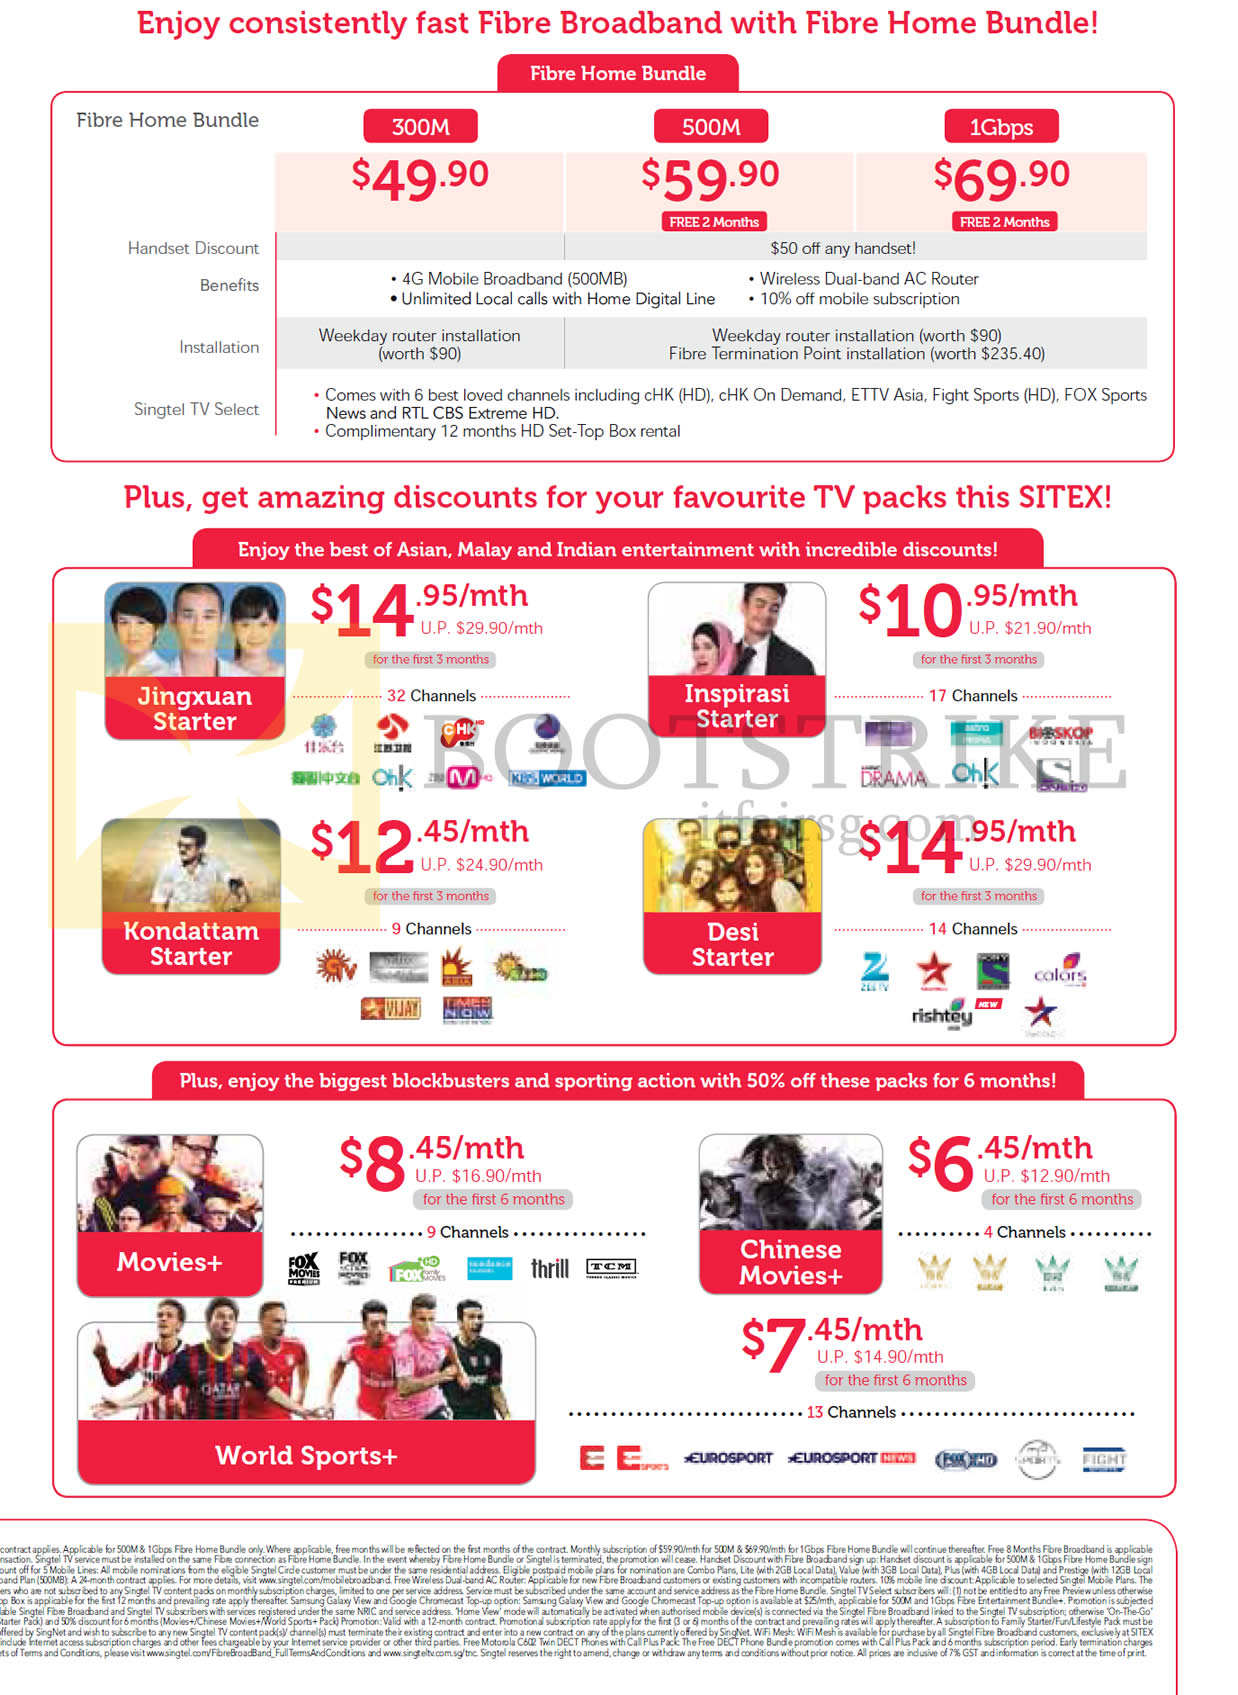 SITEX 2015 price list image brochure of Singtel Fibre Broadband Home Bundles 300M 500M 1Gbps, TV Packs, Jingxuan, Kondattam, Inspirasi, Desi Starter, Movies Plus, Chinese Movies Plus, World Sports Plus